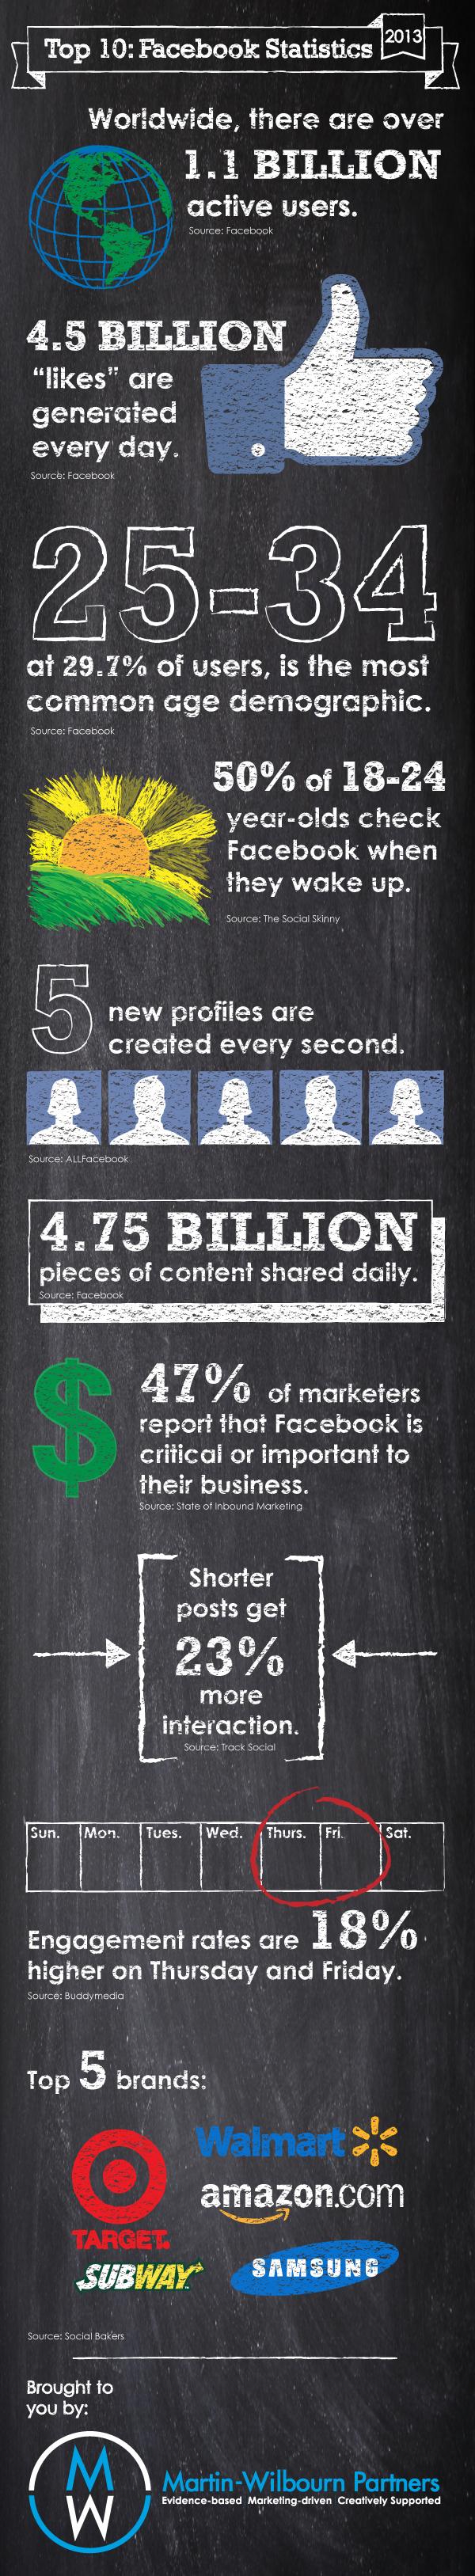 2013 Face book Statistics